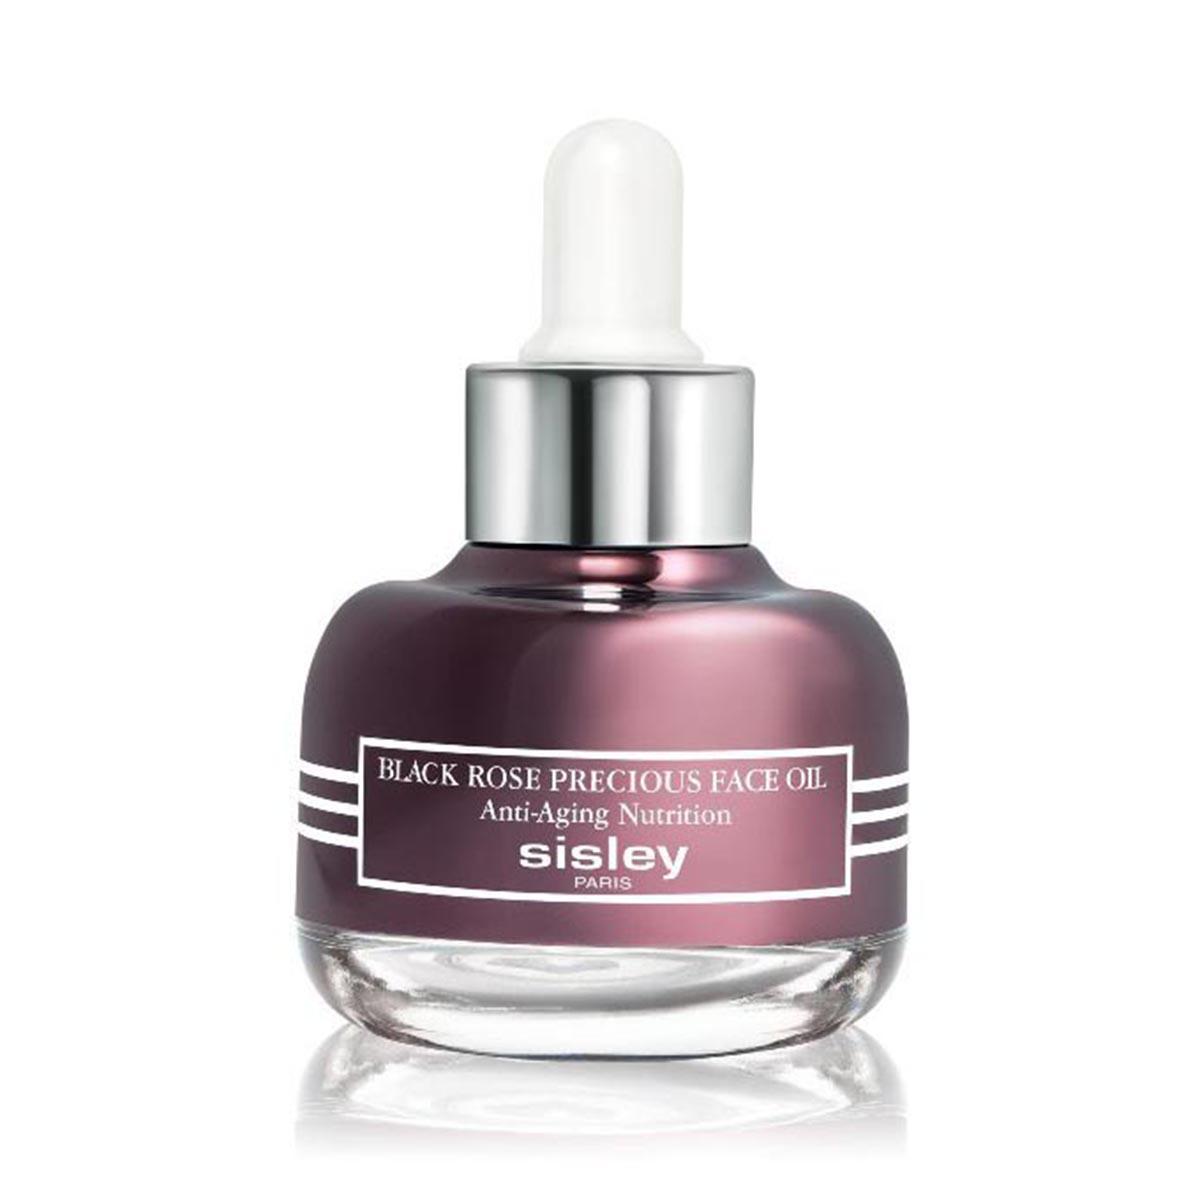 Sisley black rose precious face oil anti aging nutrition creme 25ml